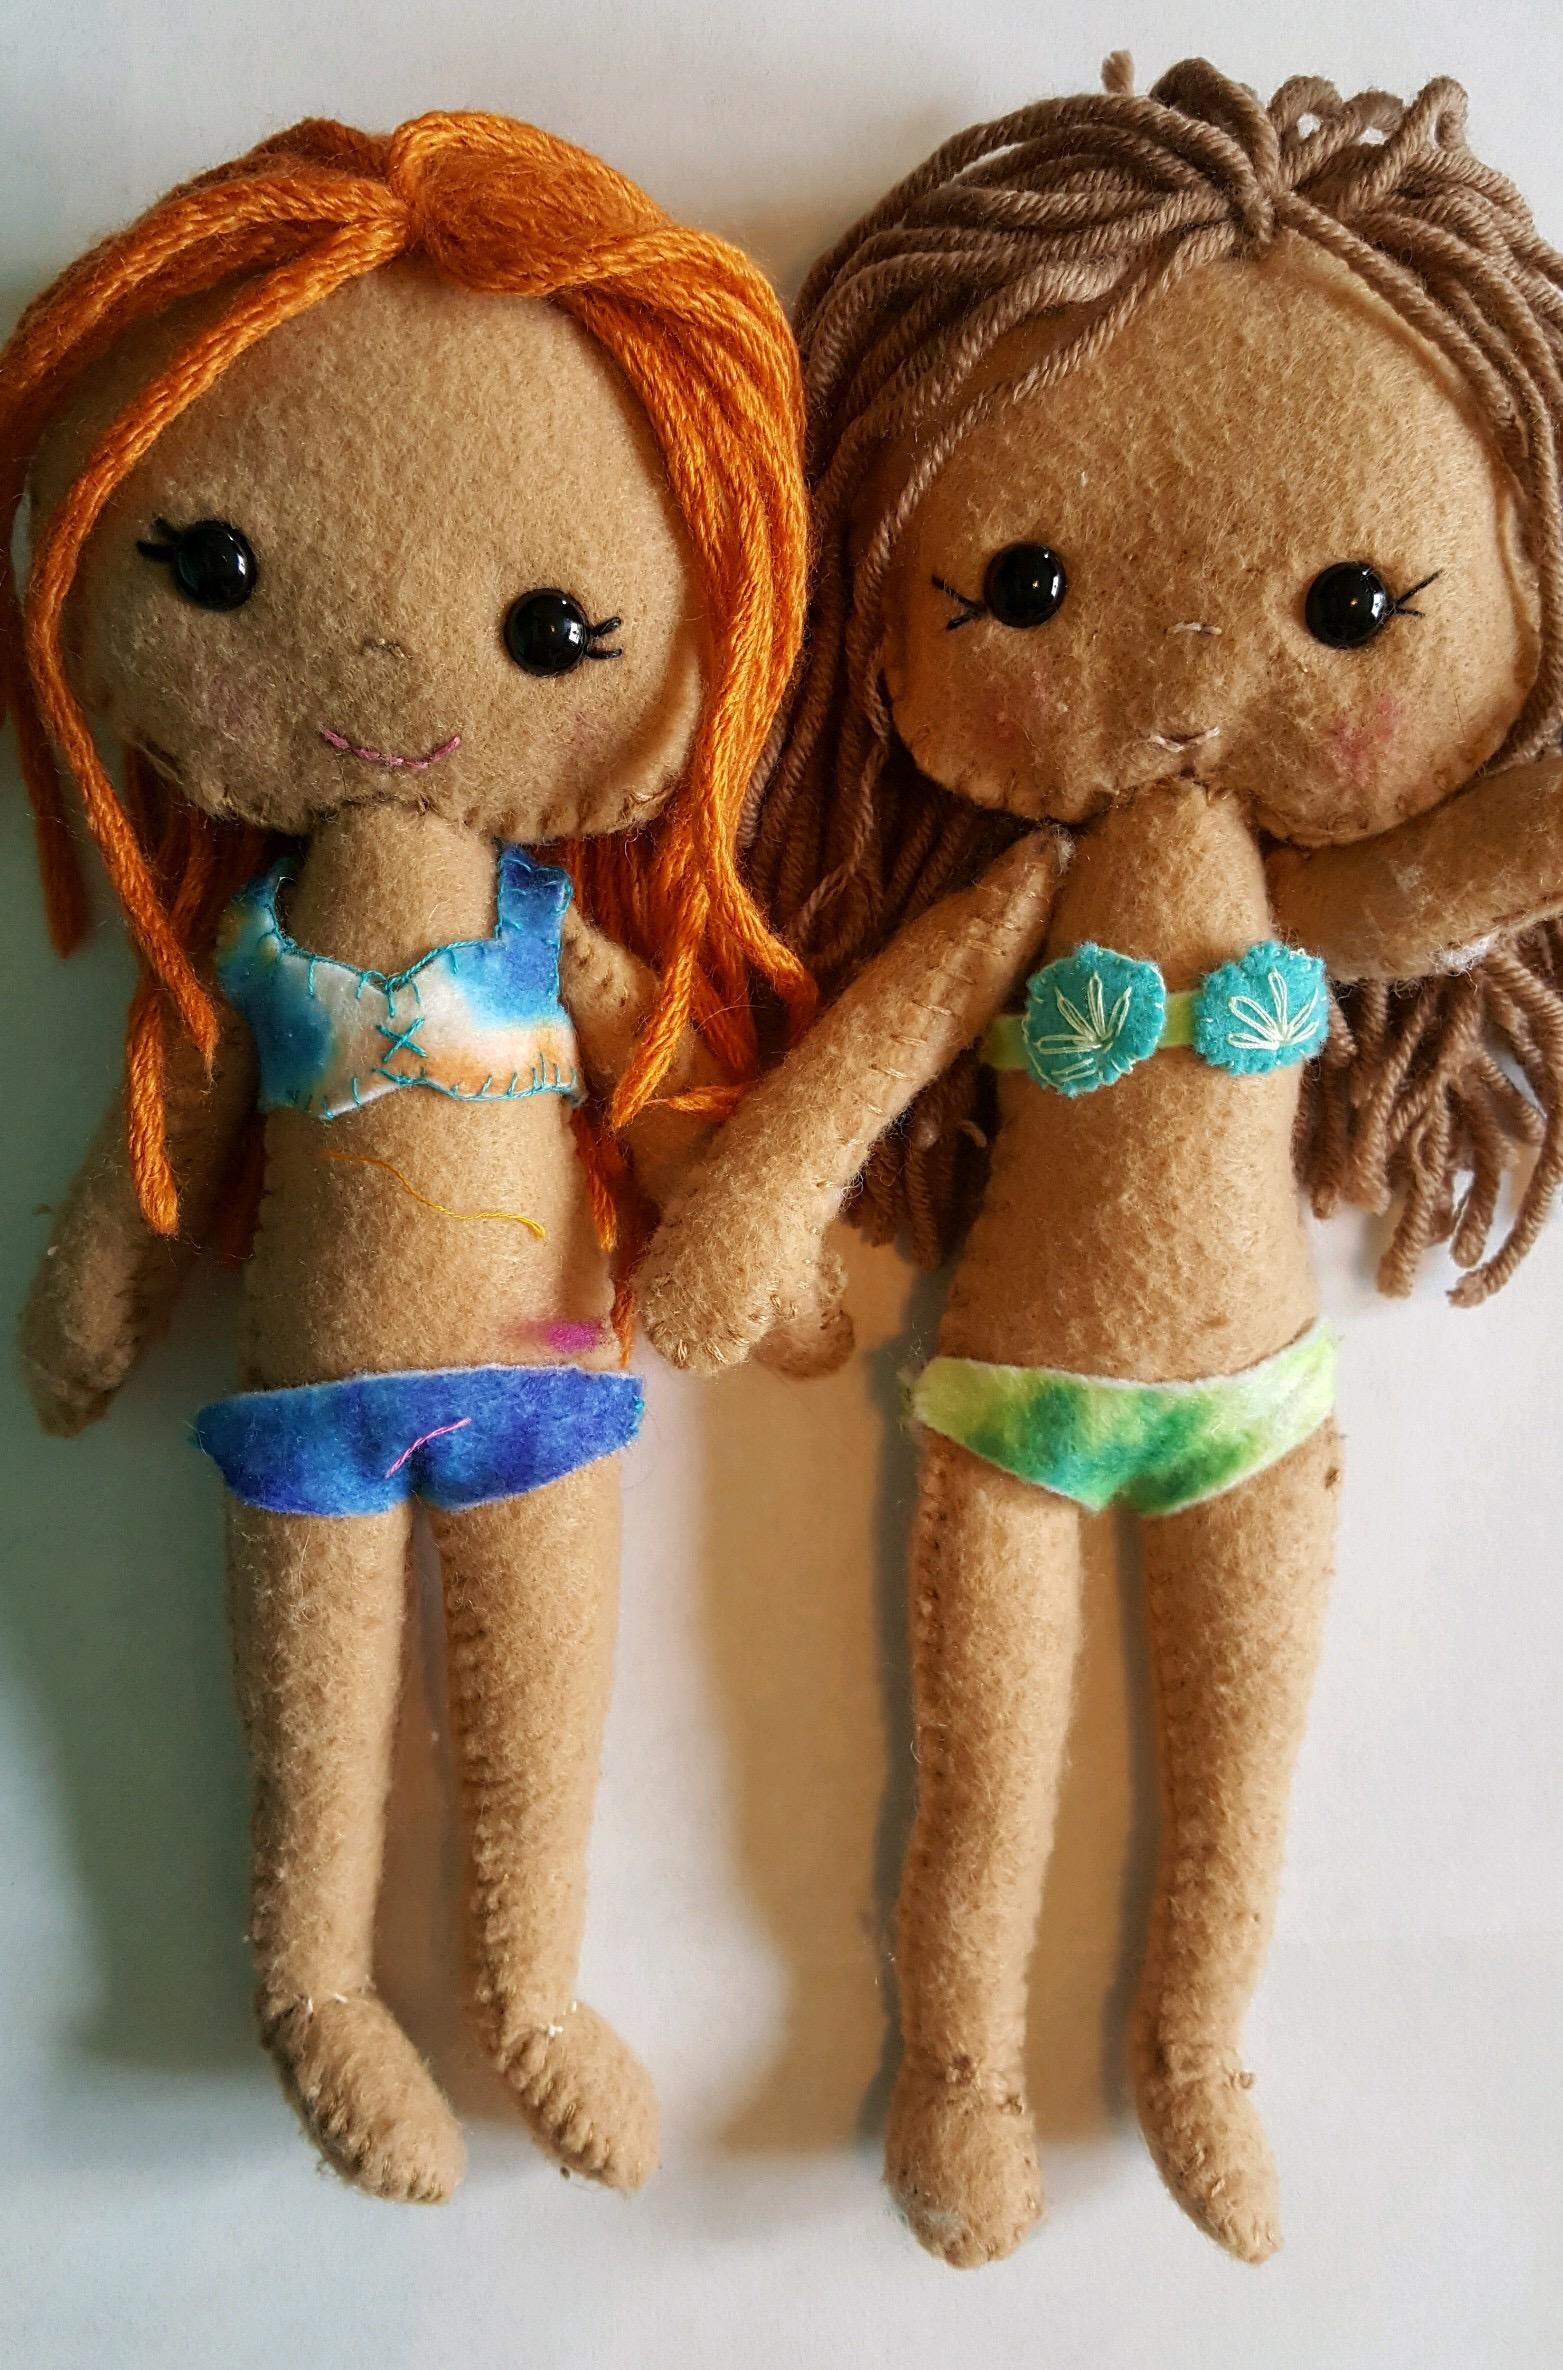 Redhead girl, handmade by Gabs             Brown haired girl, handmade by Calista